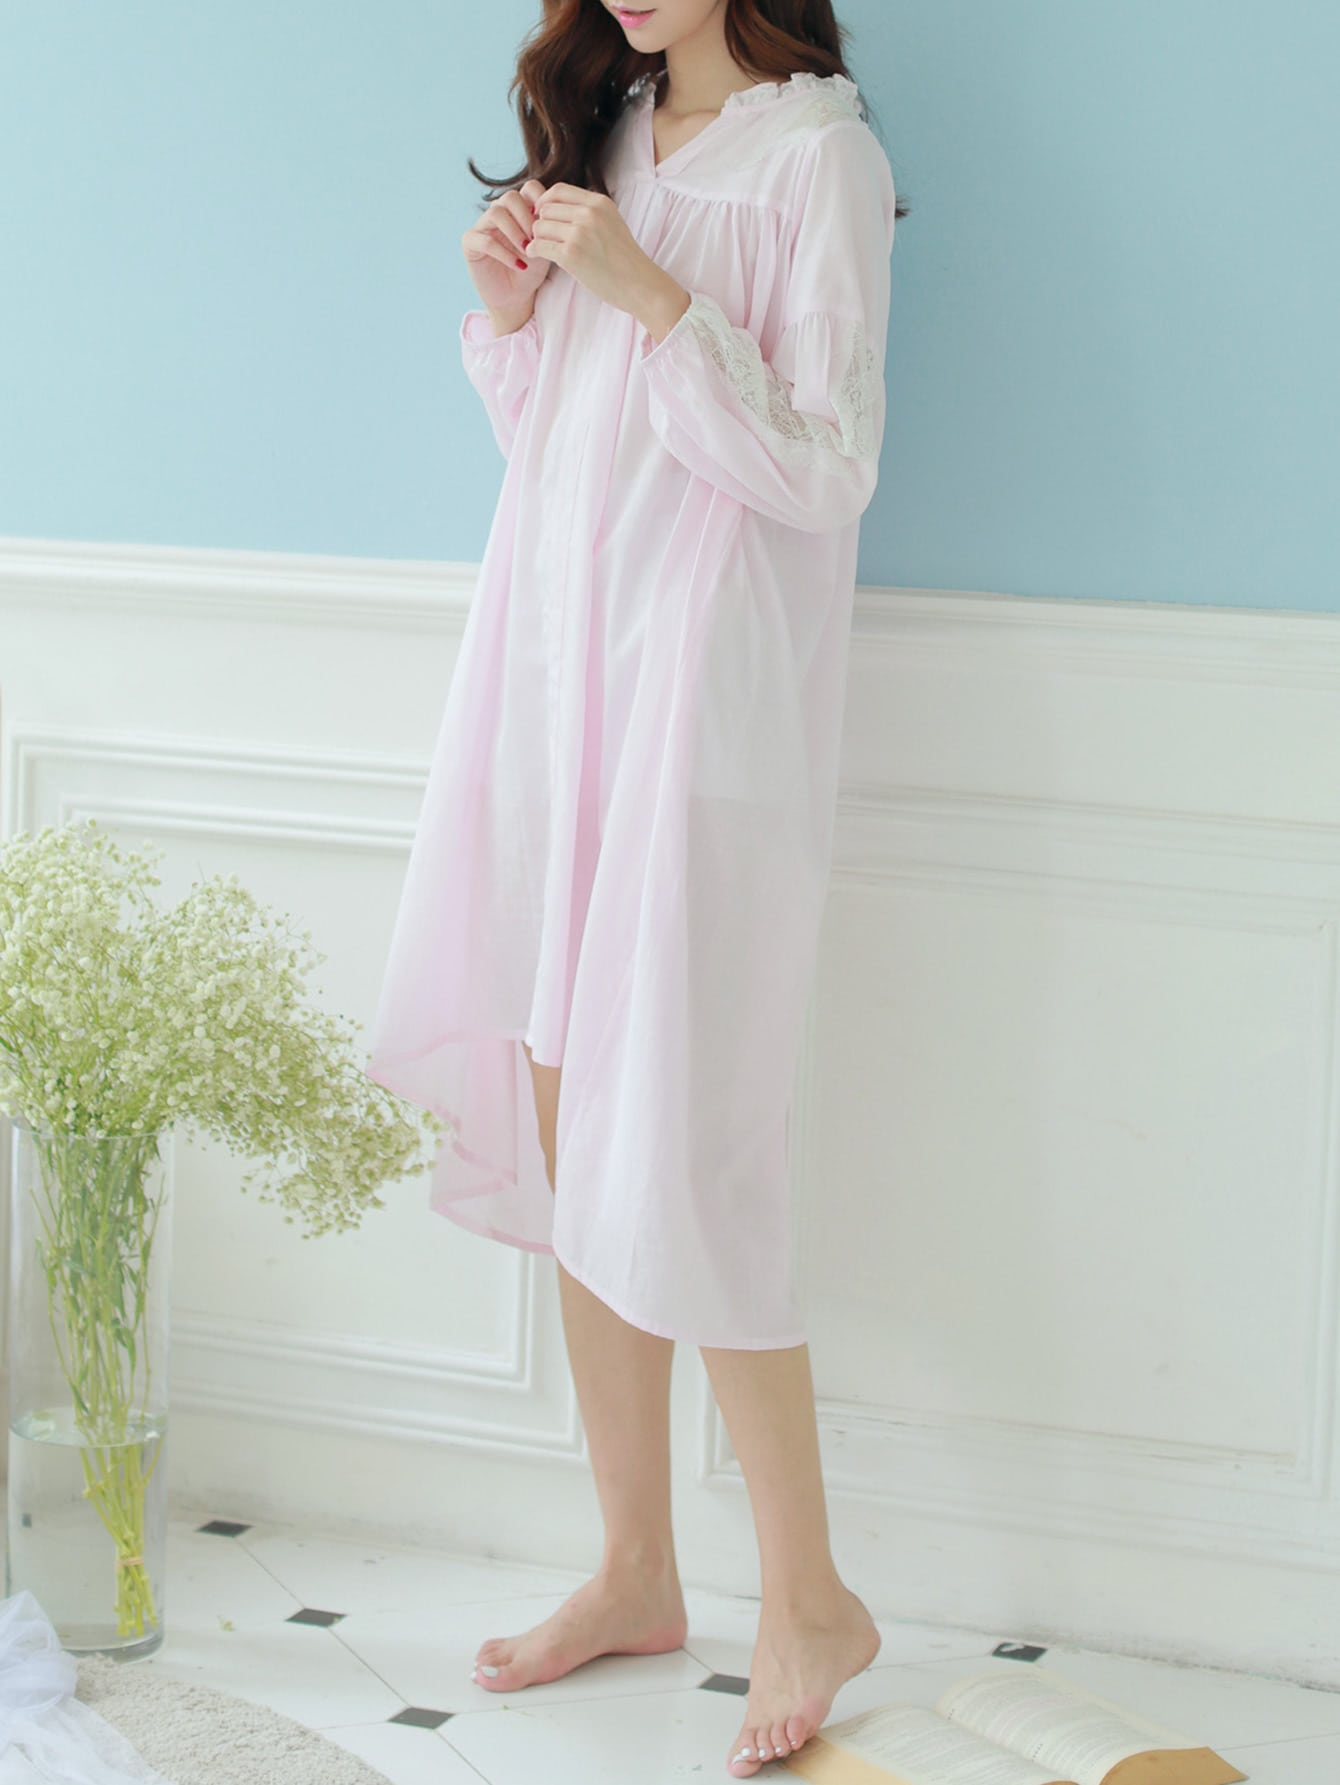 Contrast Lace Frill Trim Dress maison jules new junior s small s pink combo lace crepe contrast trim dress $89